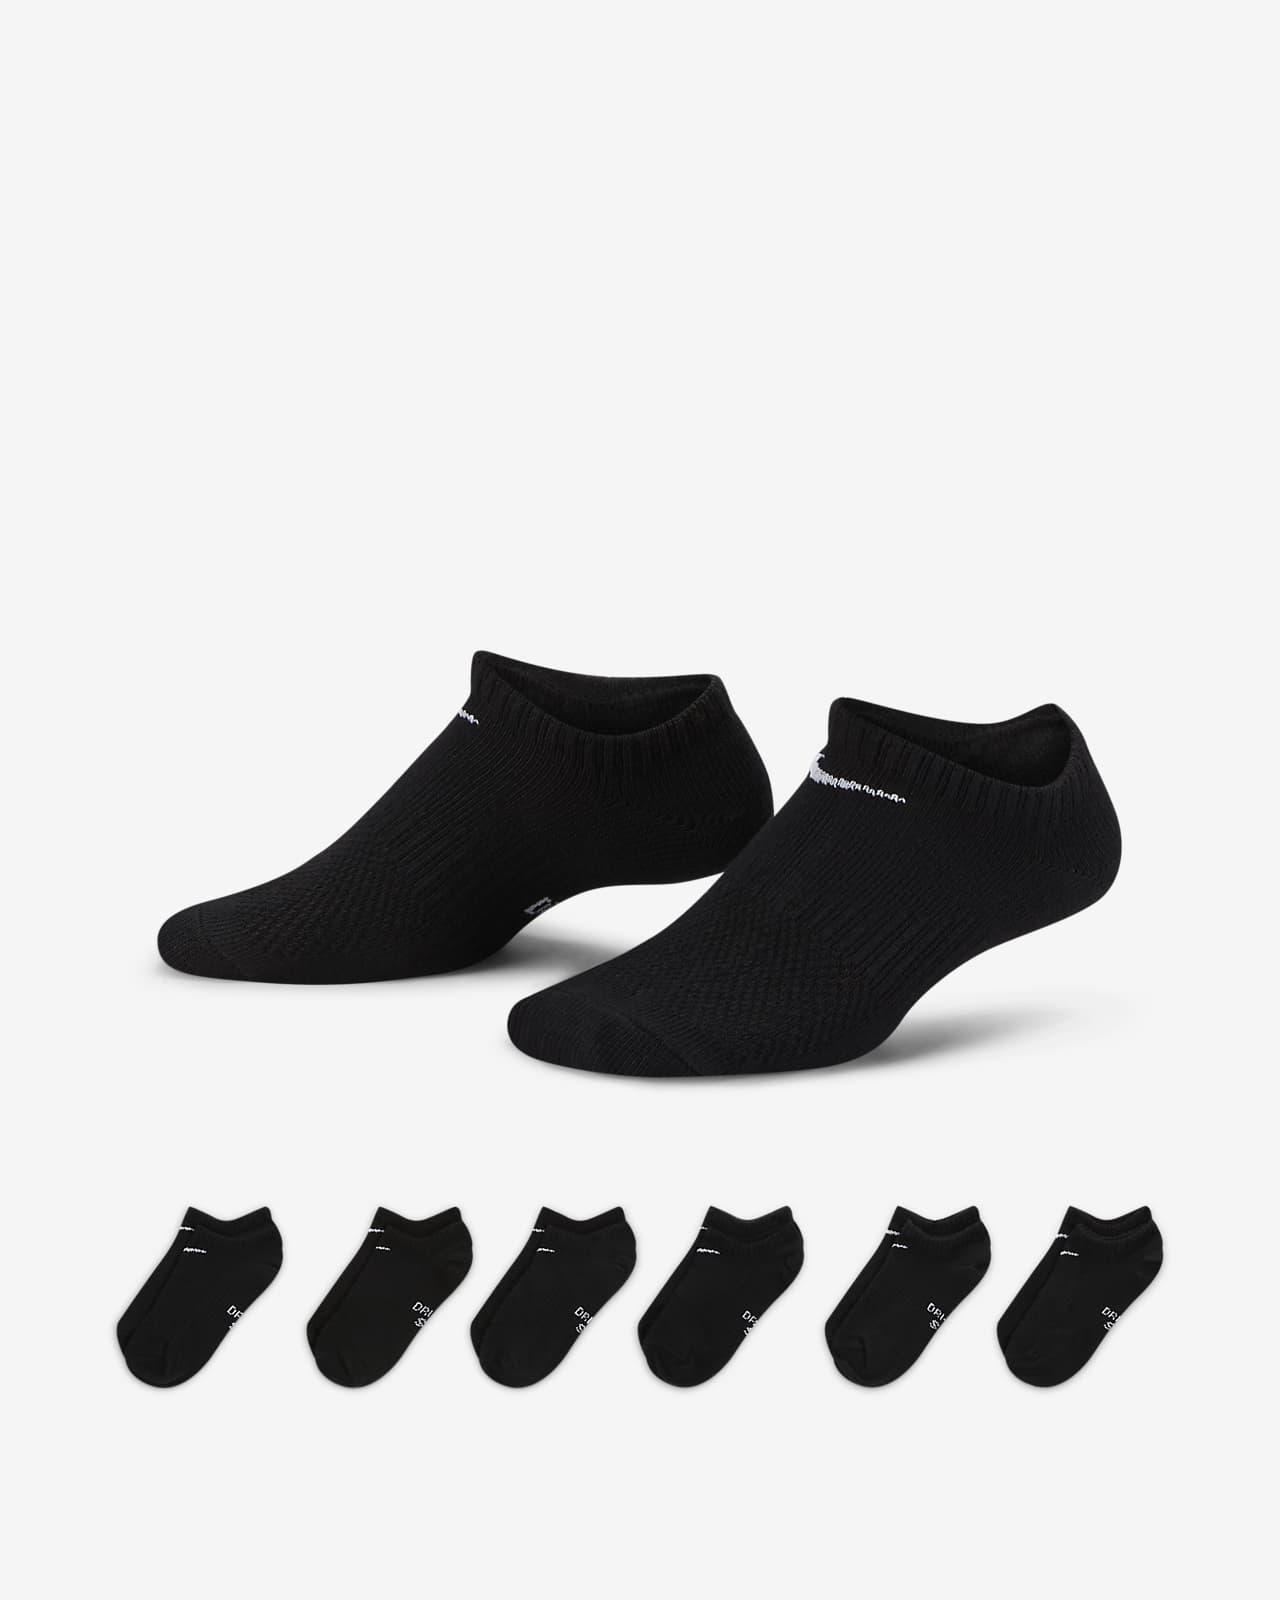 Calcetines de entrenamiento para niños Nike Performance Lightweight No-Show (6 pares)